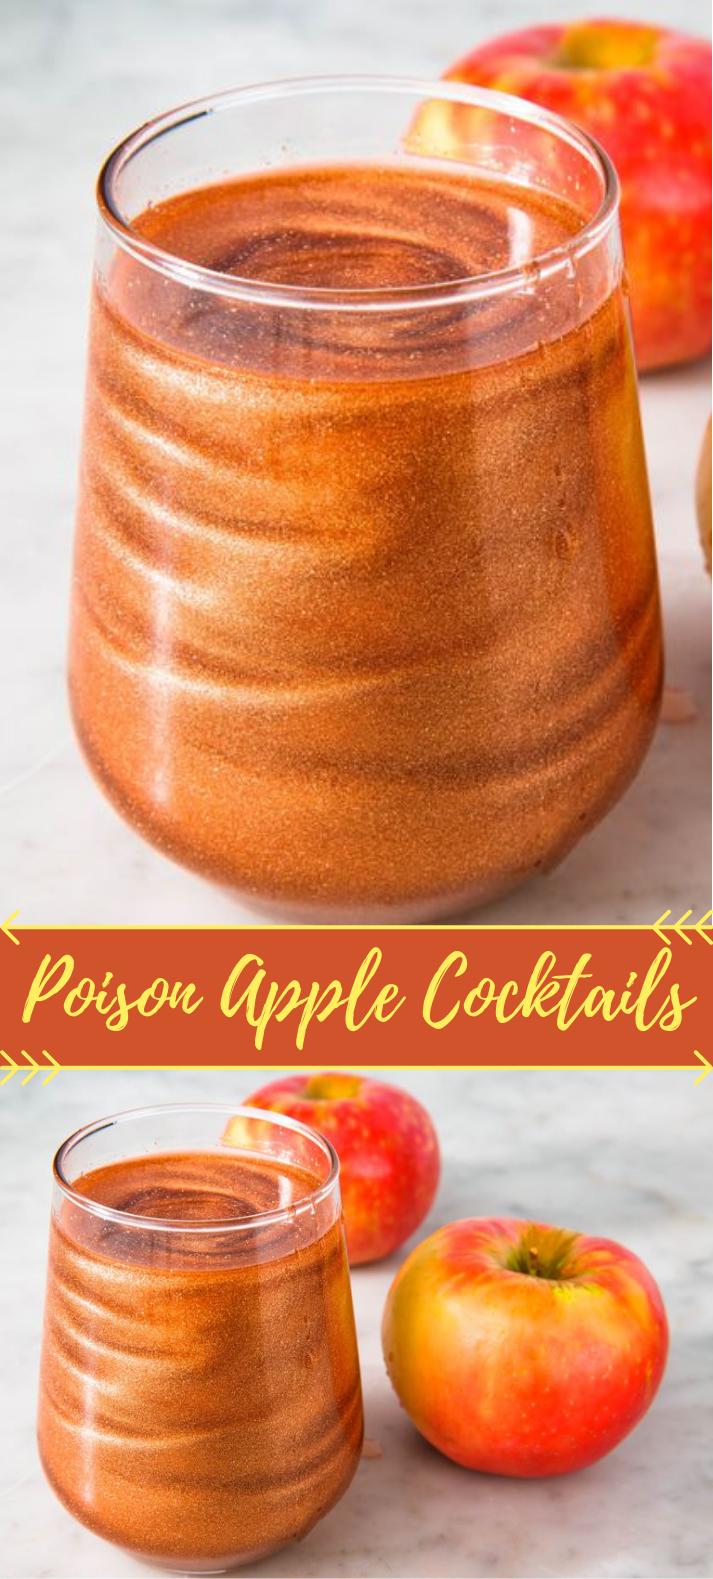 Poison Apple Cocktails #MixedDrink #HalloweenParty